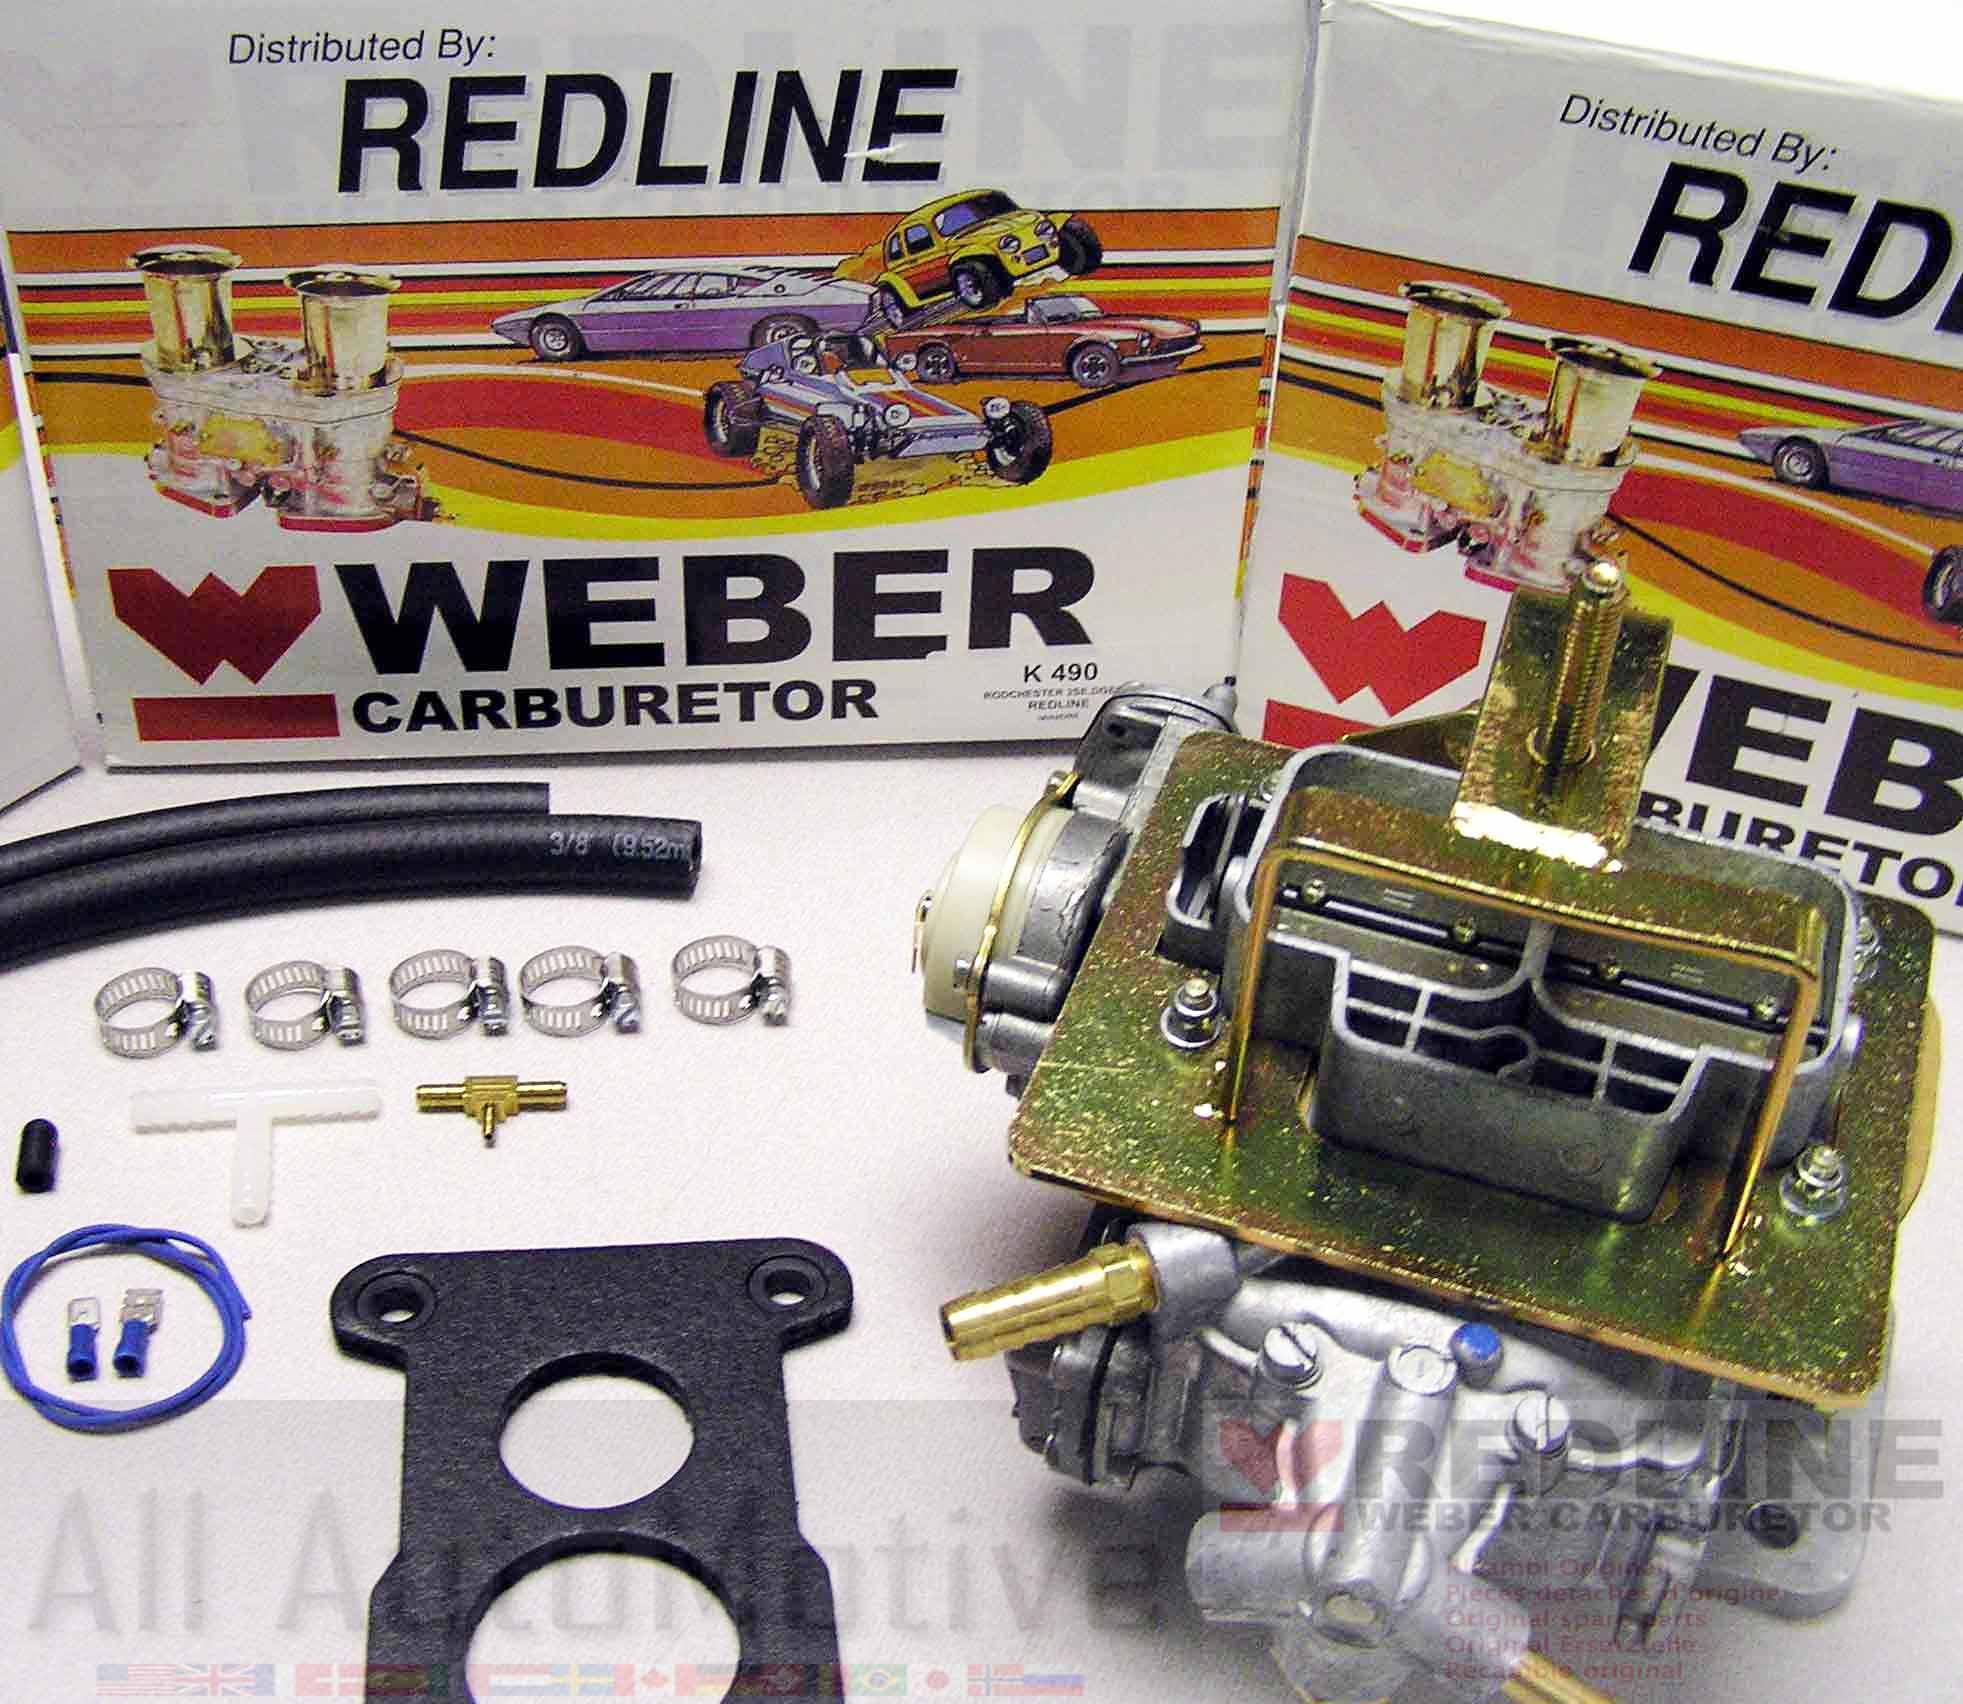 Jeep Chevy GMC 2.8 Weber Carburetor Conversion Kit